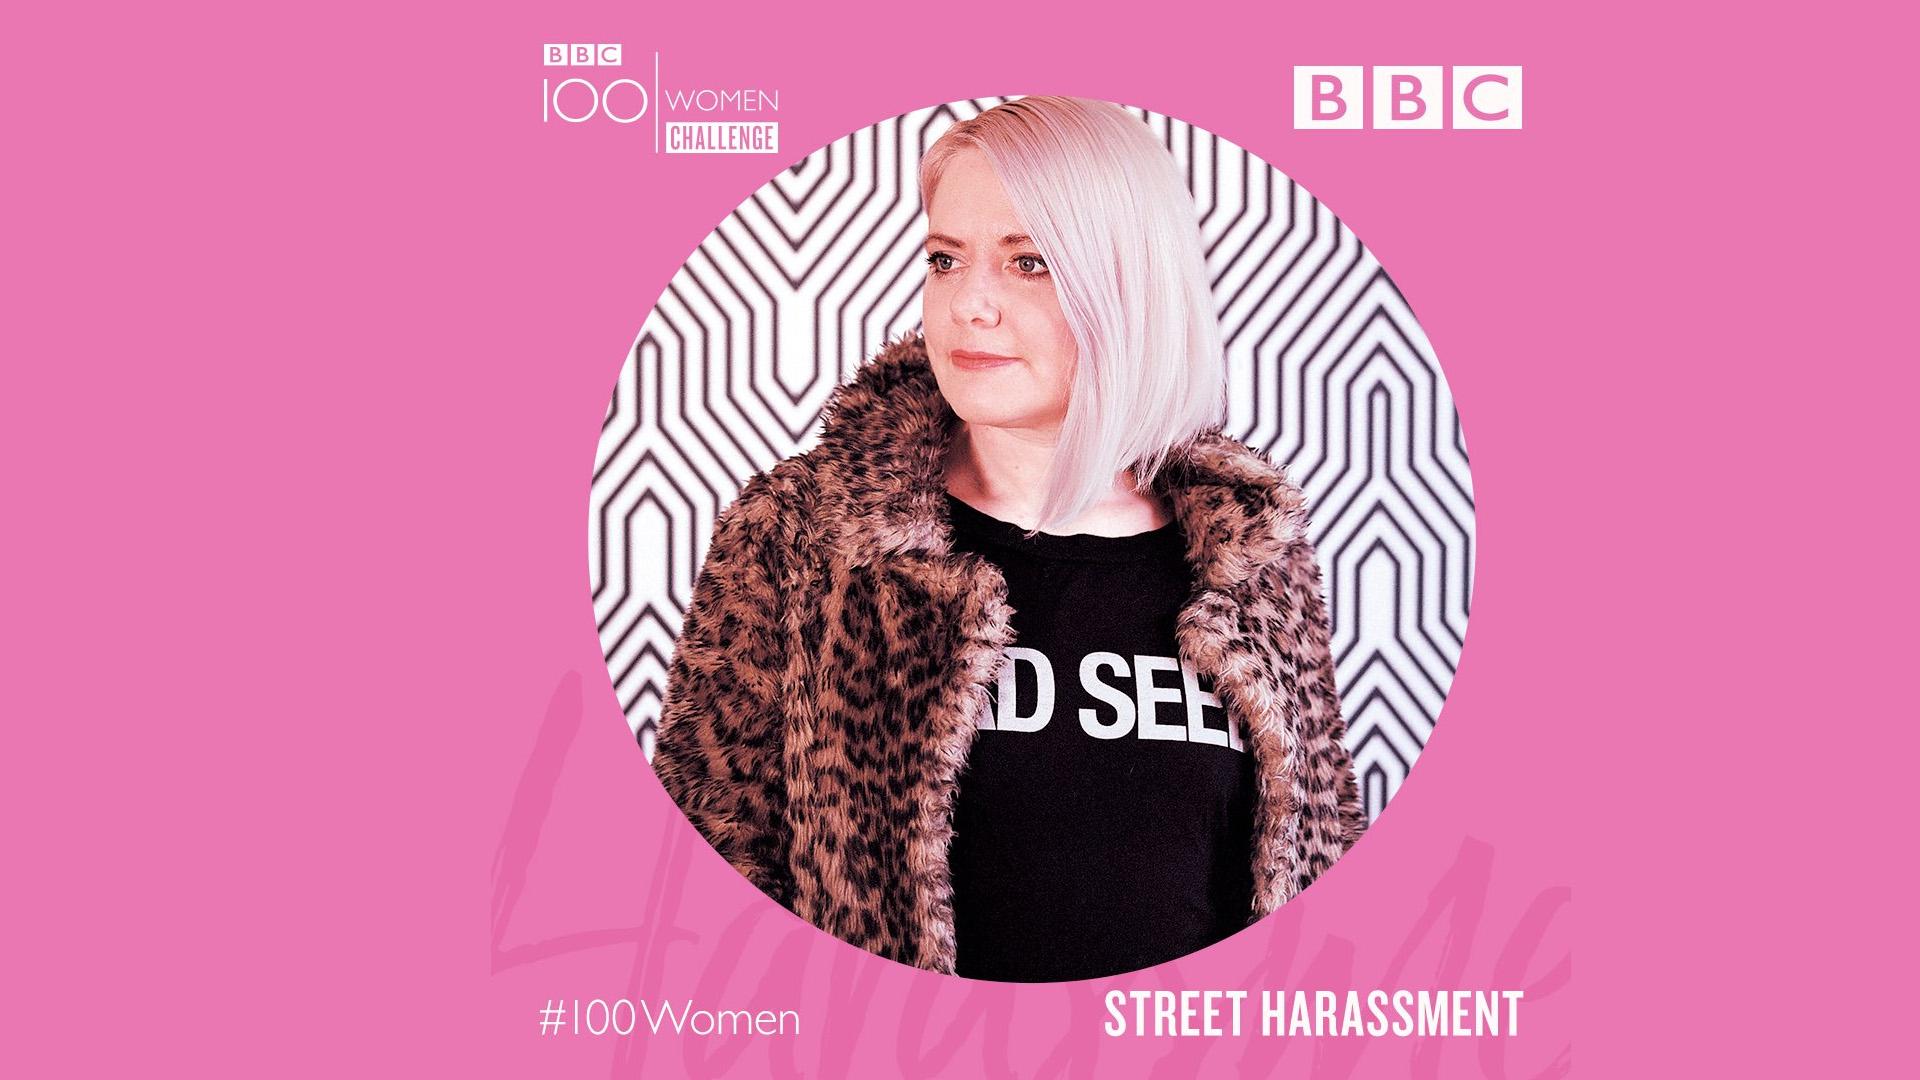 BBC_100_Women_1920x1080.jpg